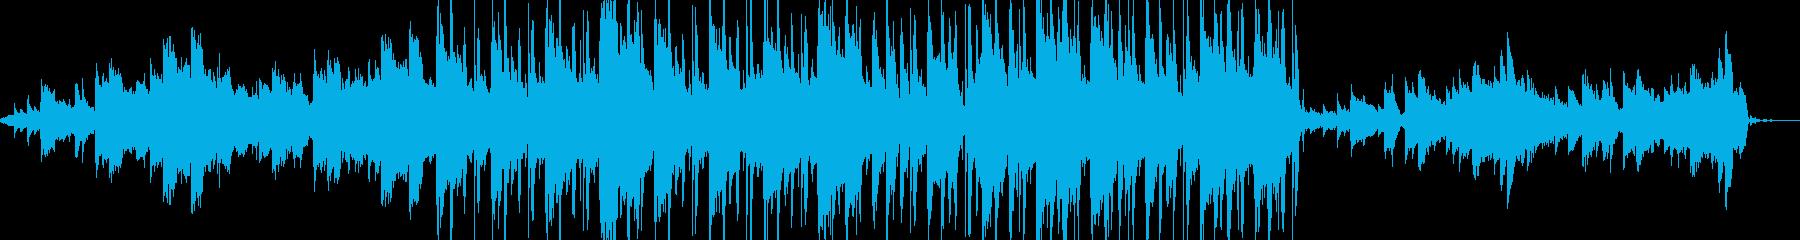 【CM】夕焼けを背景にドライヴの再生済みの波形